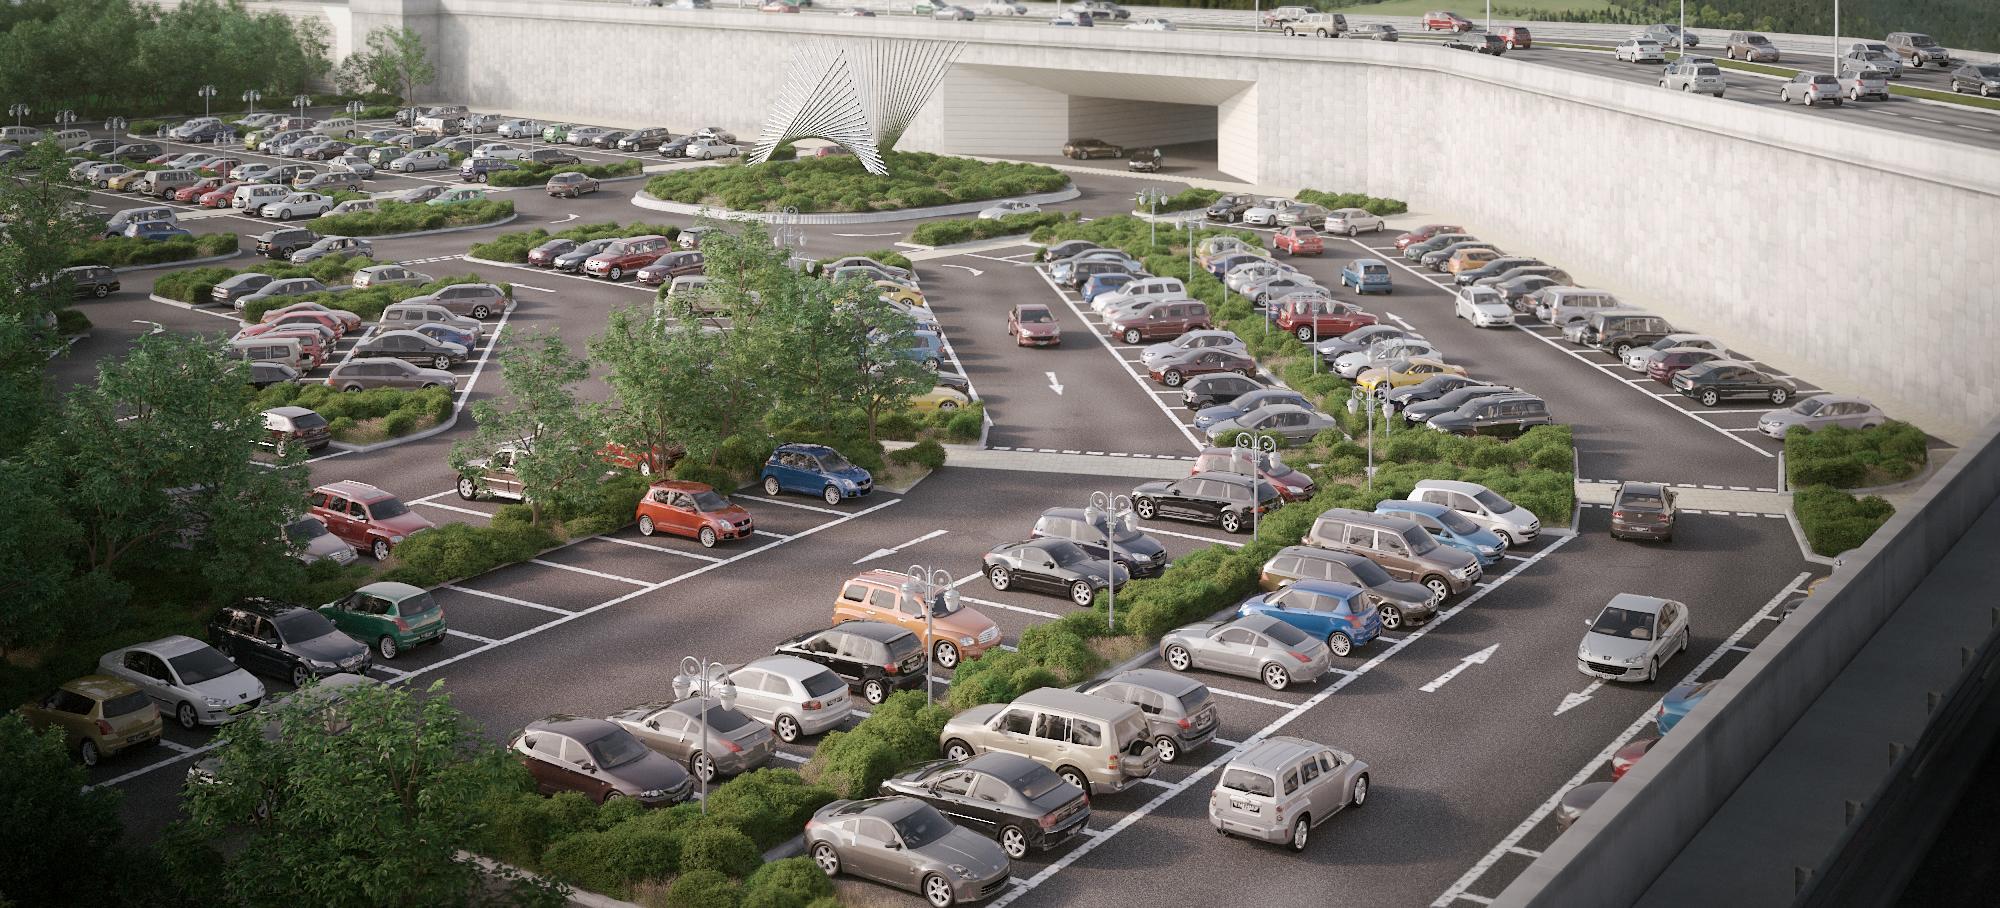 Parking Cars-carsfull.jpg